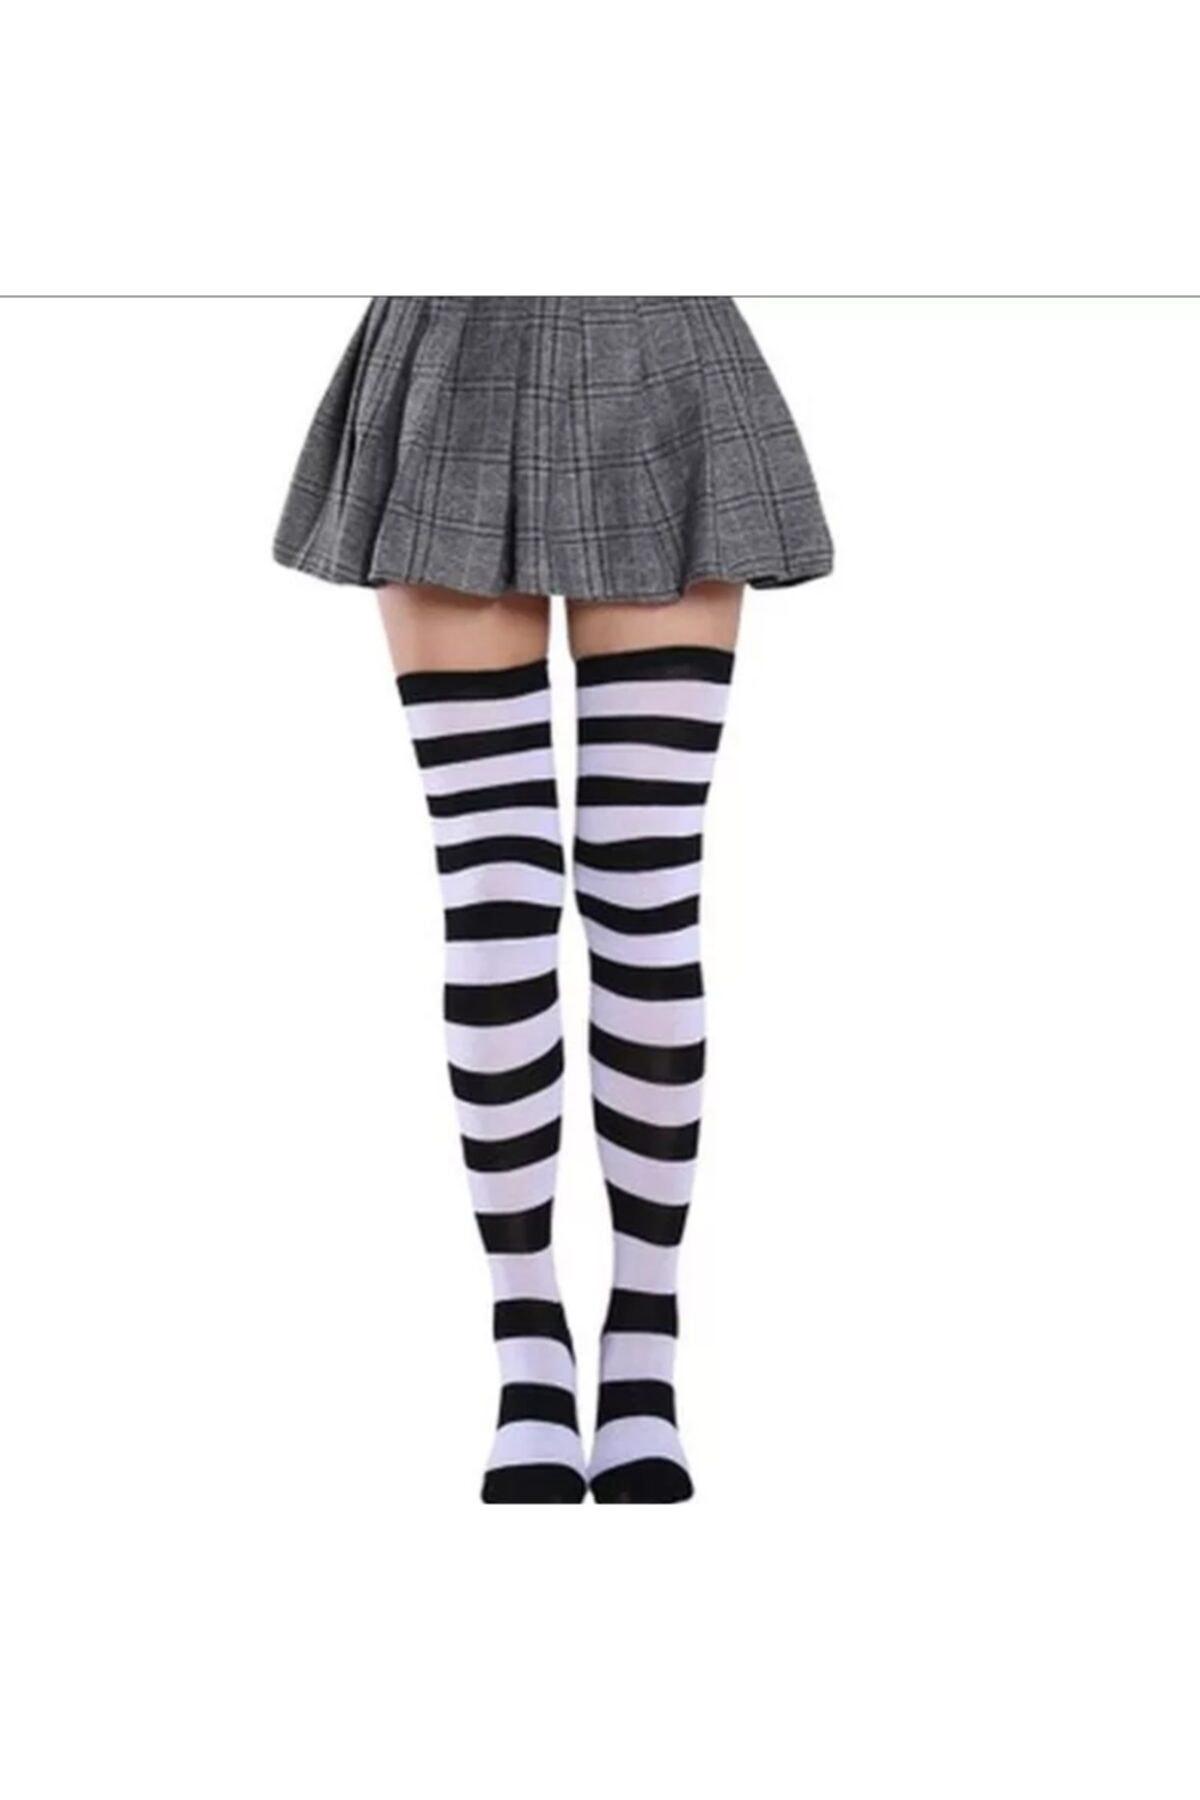 Cindiy Siyah Beyaz Çizgili Diz Üstü Çorap 1